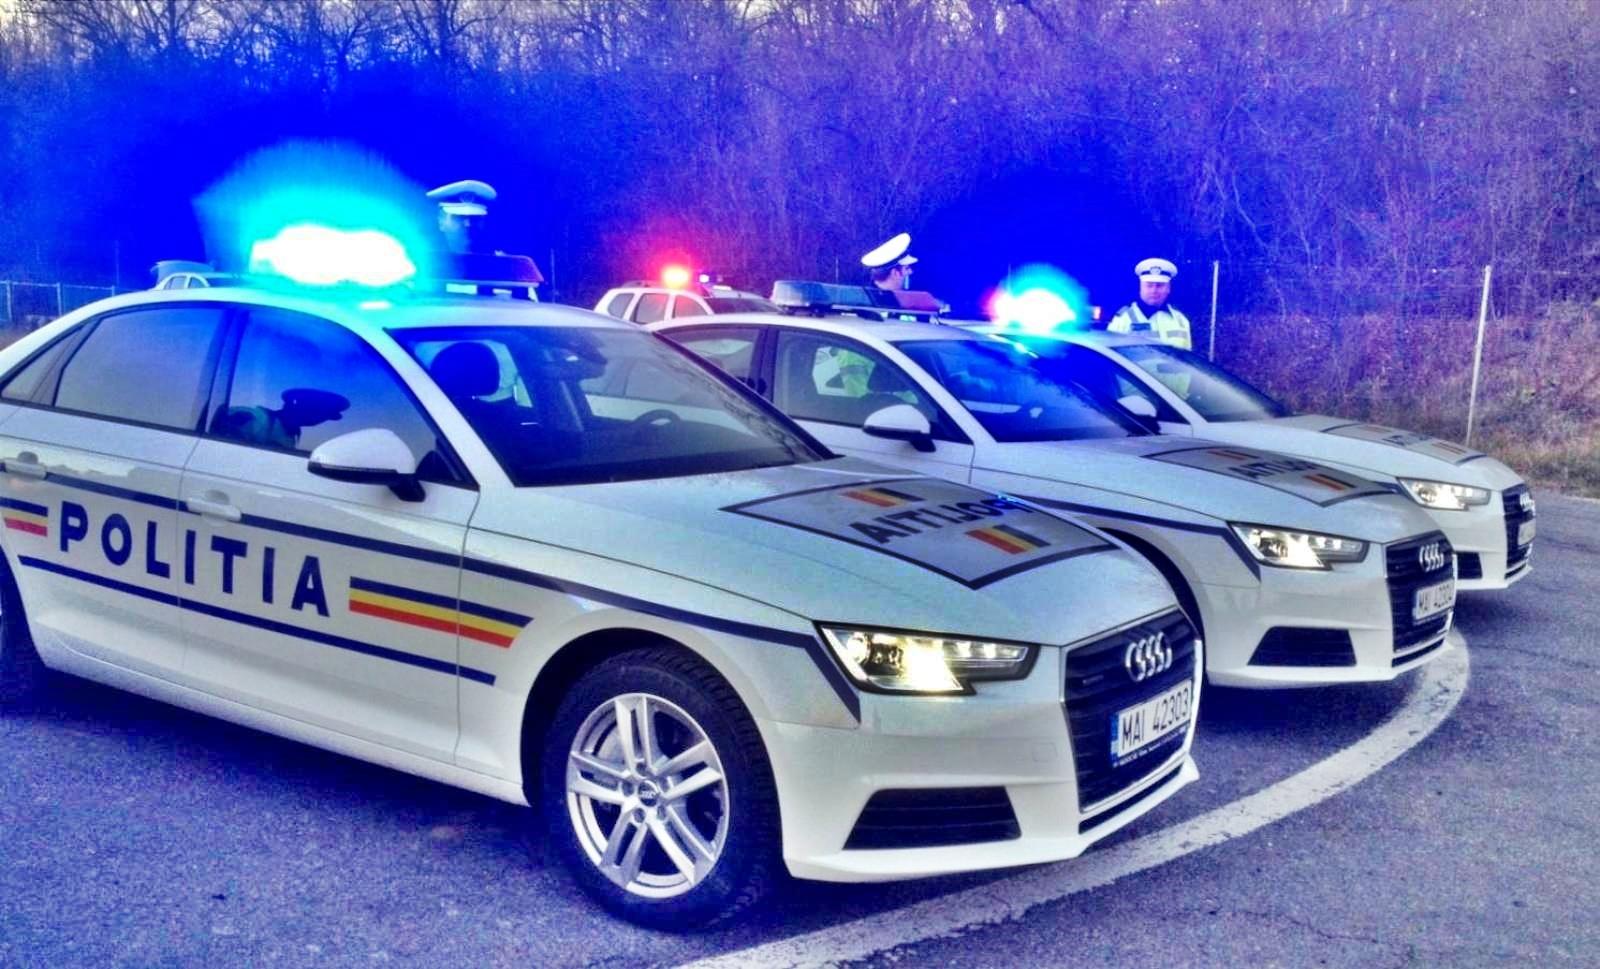 Politia Romana Alerta Inselaciunile Metoda COVID-19